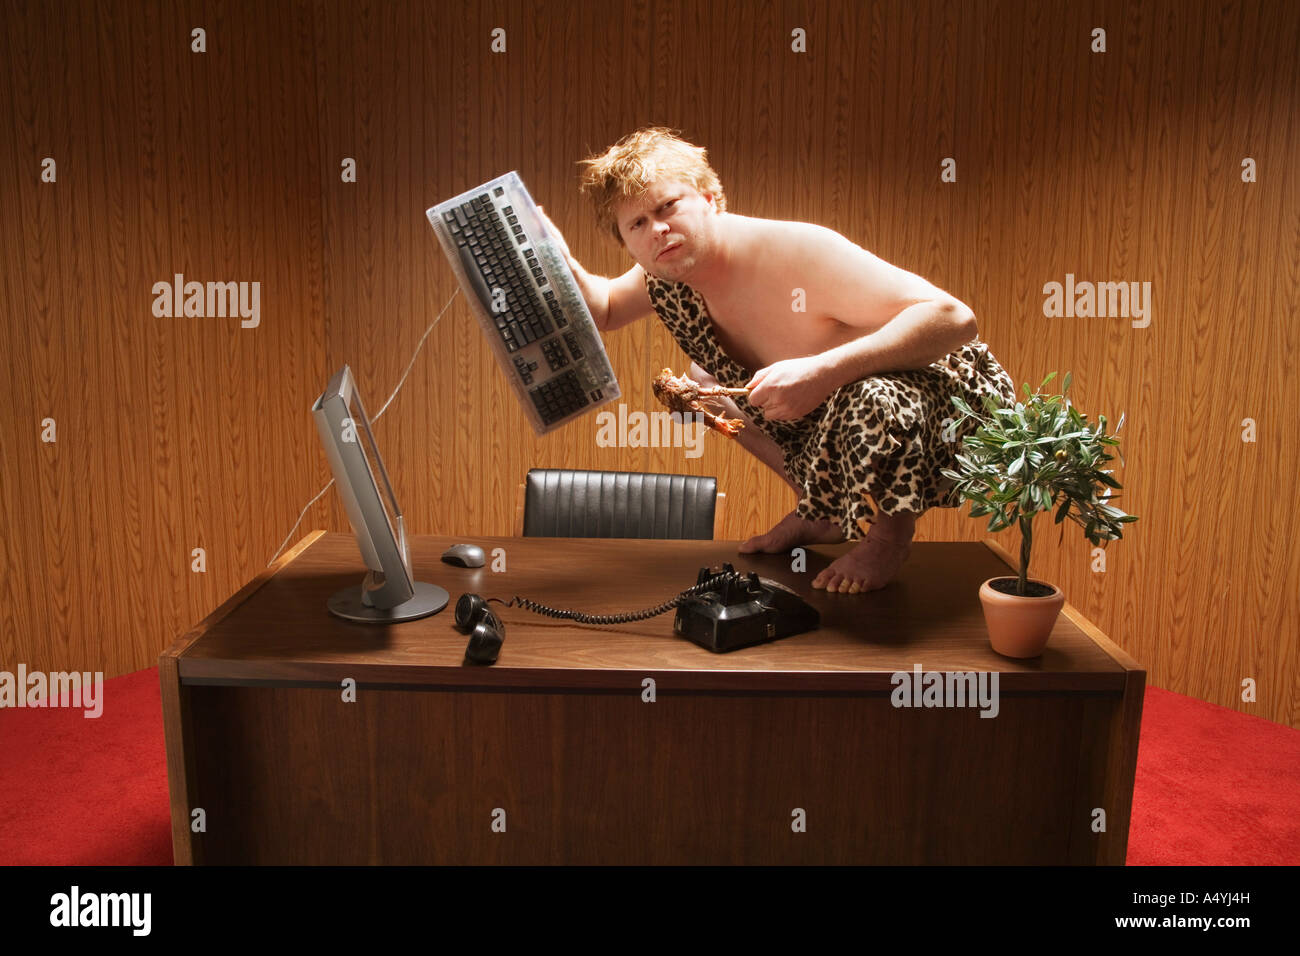 Businessman dressed as caveman crouching on desk - Stock Image